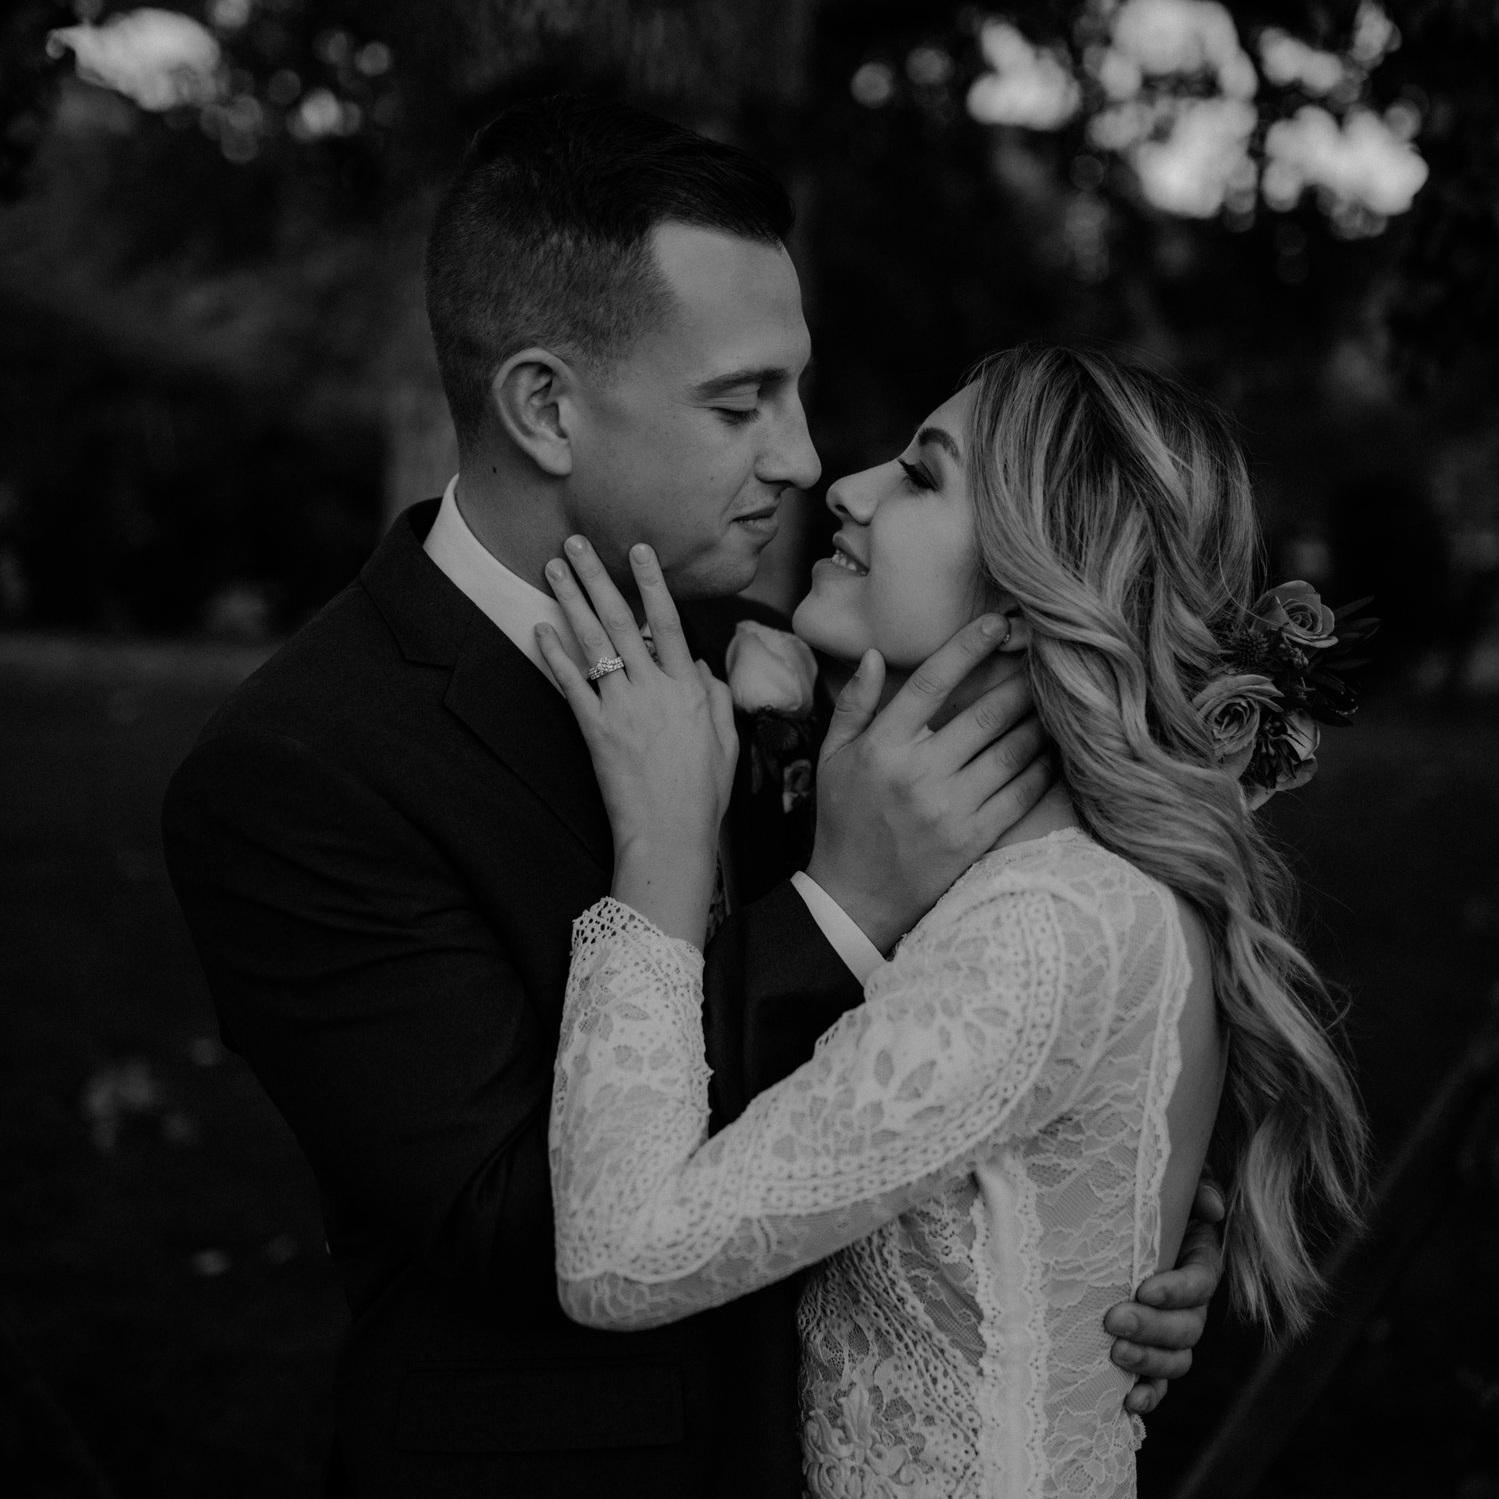 Triunfo-Creek-Vineyards-Intimate-Wedding-55.jpg